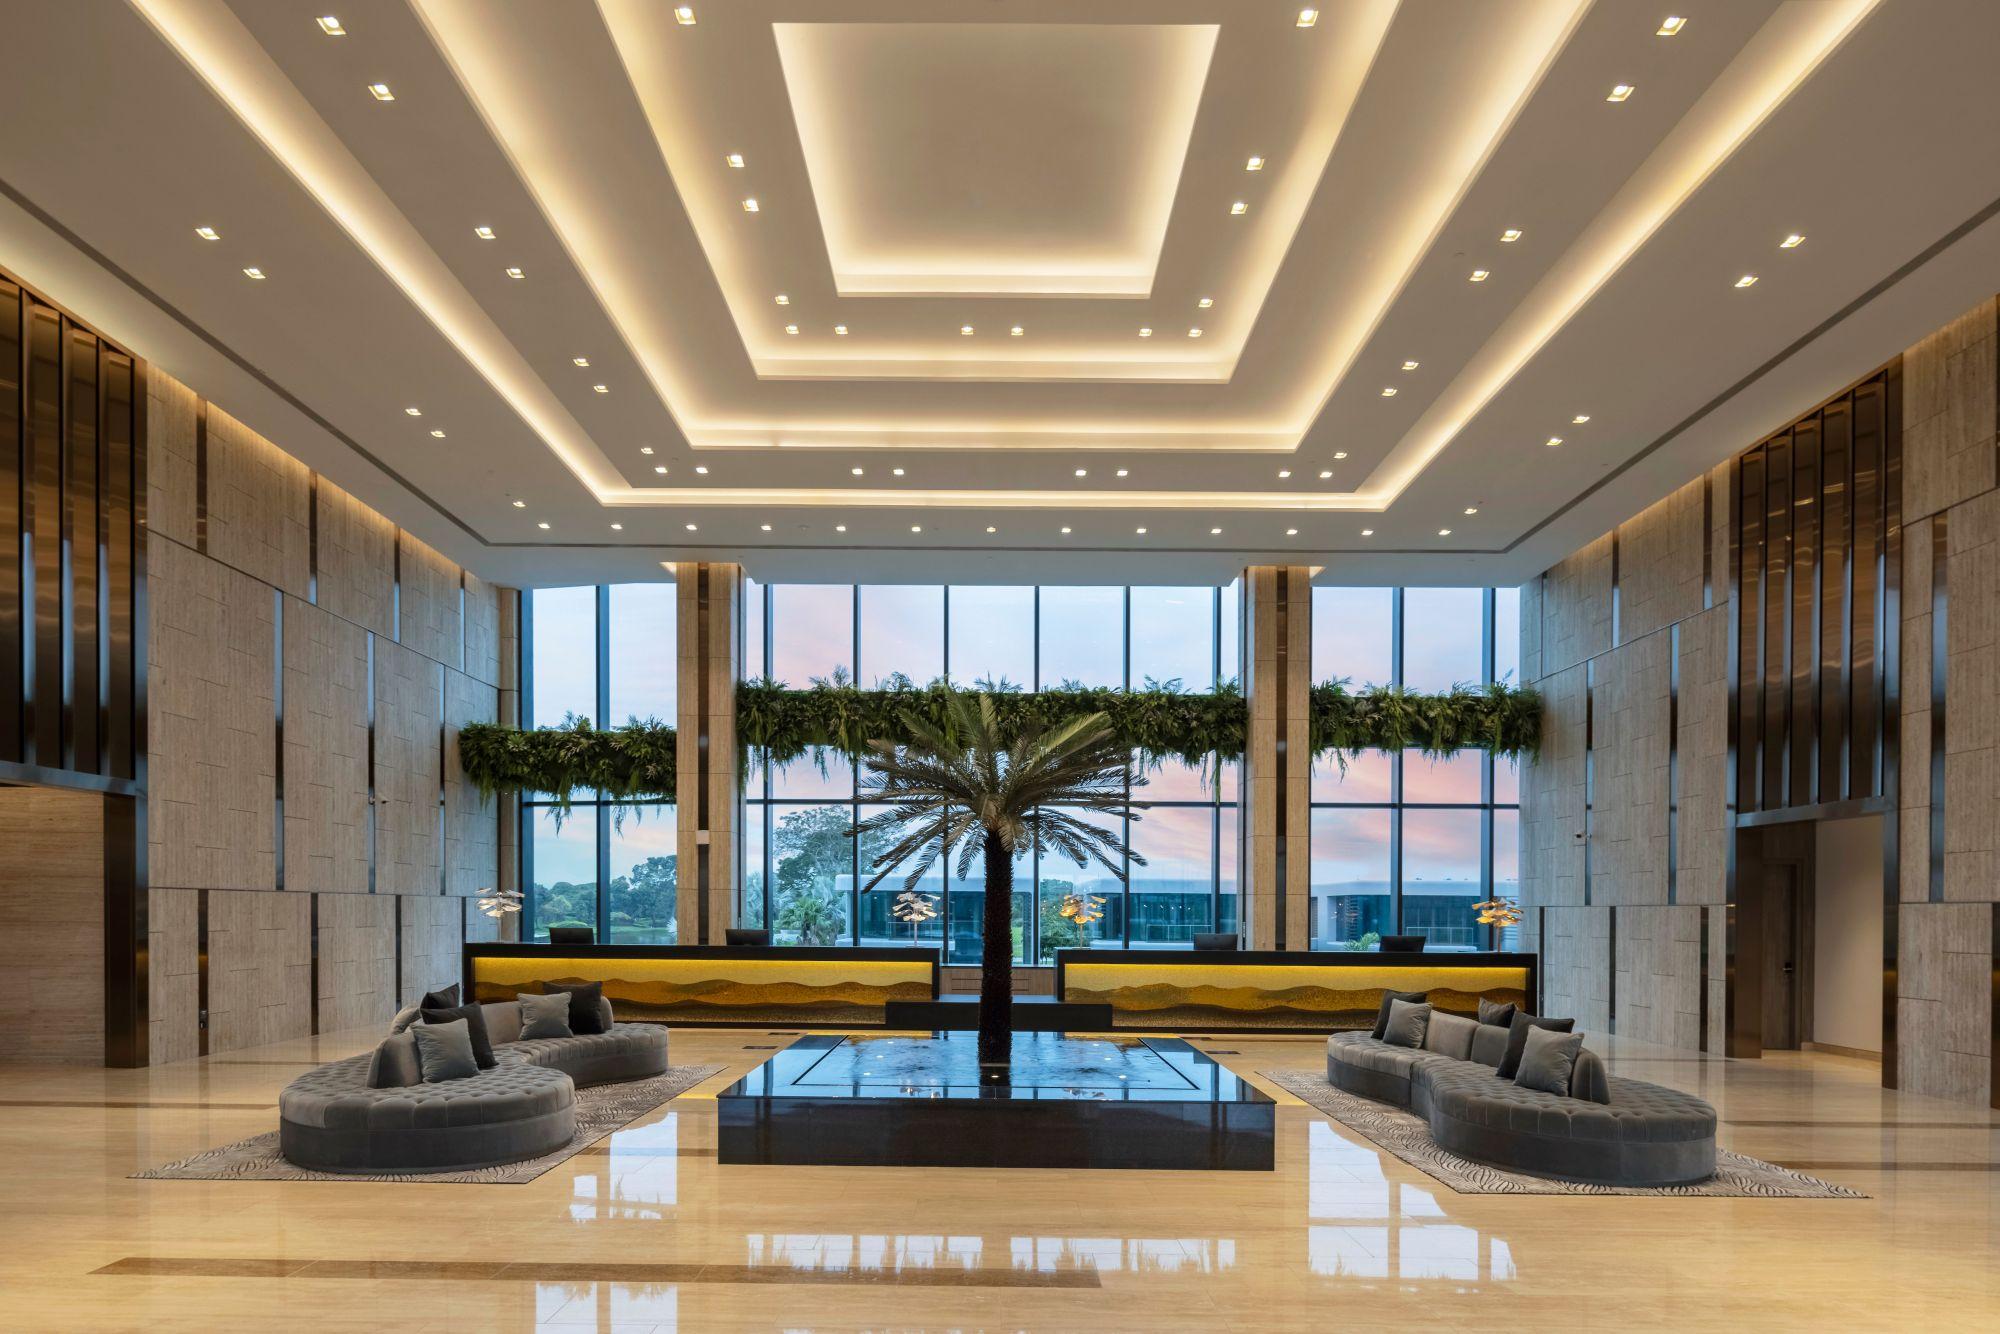 Dusit Thani Laguna Singapore: Hotel Staycation Review